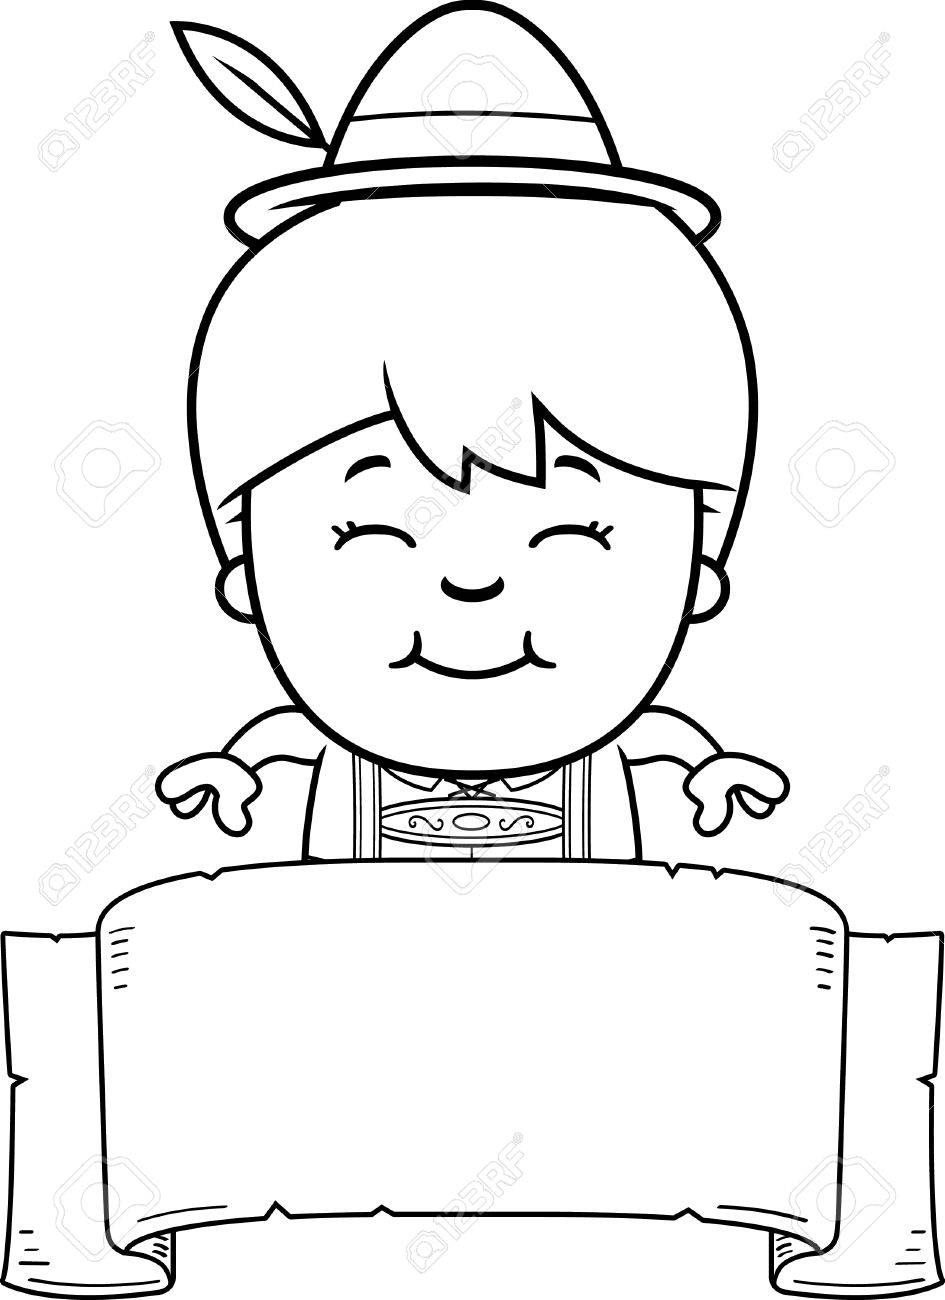 945x1300 A Cartoon Illustration Of A German Boy In Lederhosen With A Banner